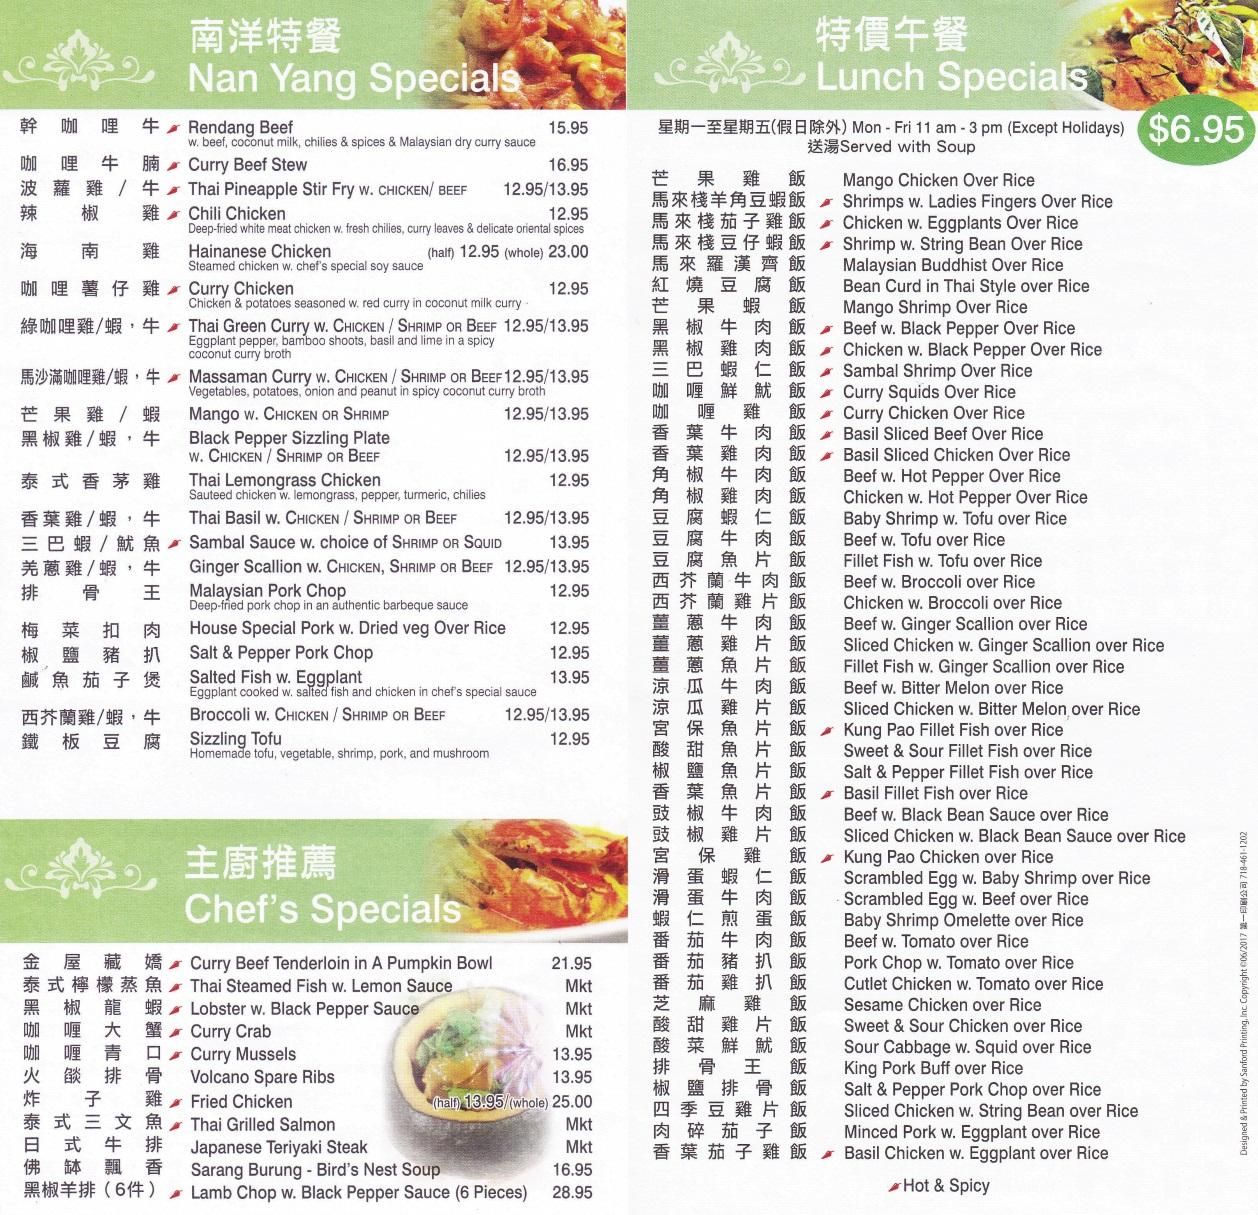 Whereisthemenu.net   Nan Yang Kitchen - Flushing, NY 11355